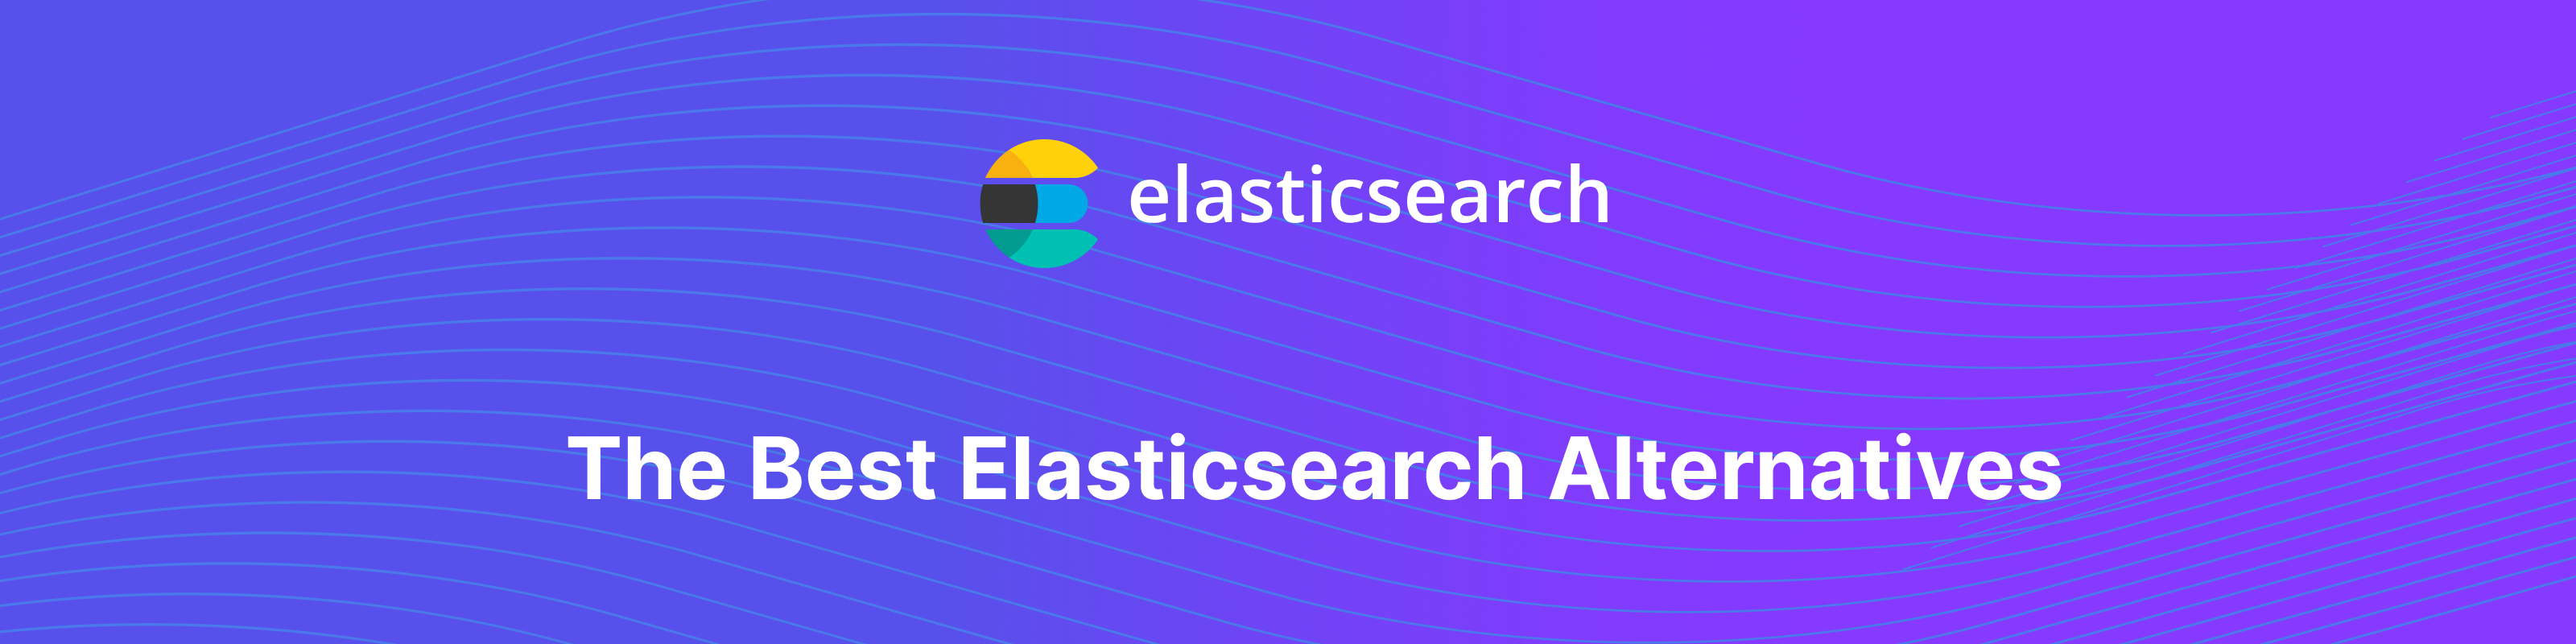 Elasticsearch alternatives banner